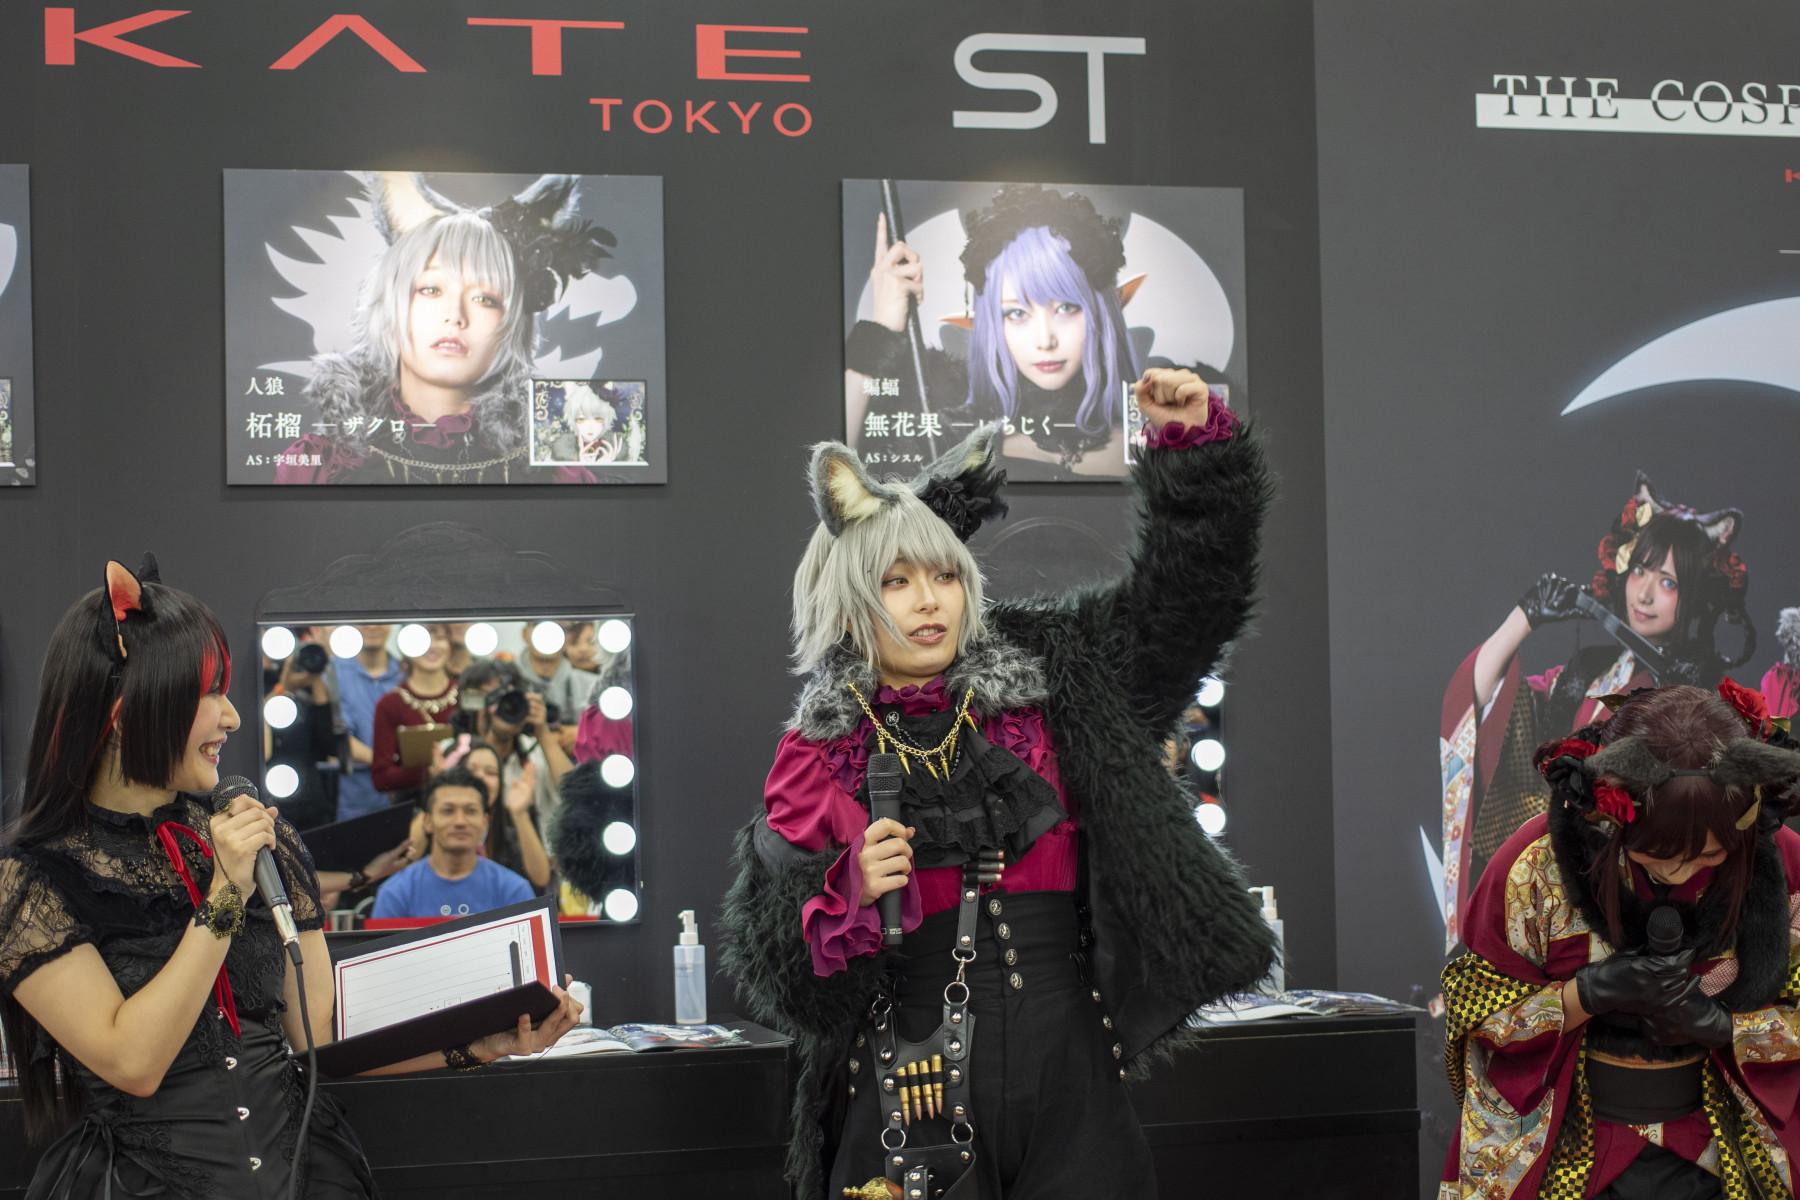 KATEのオリジナルキャラクターである人狼「柘榴(ザクロ)」